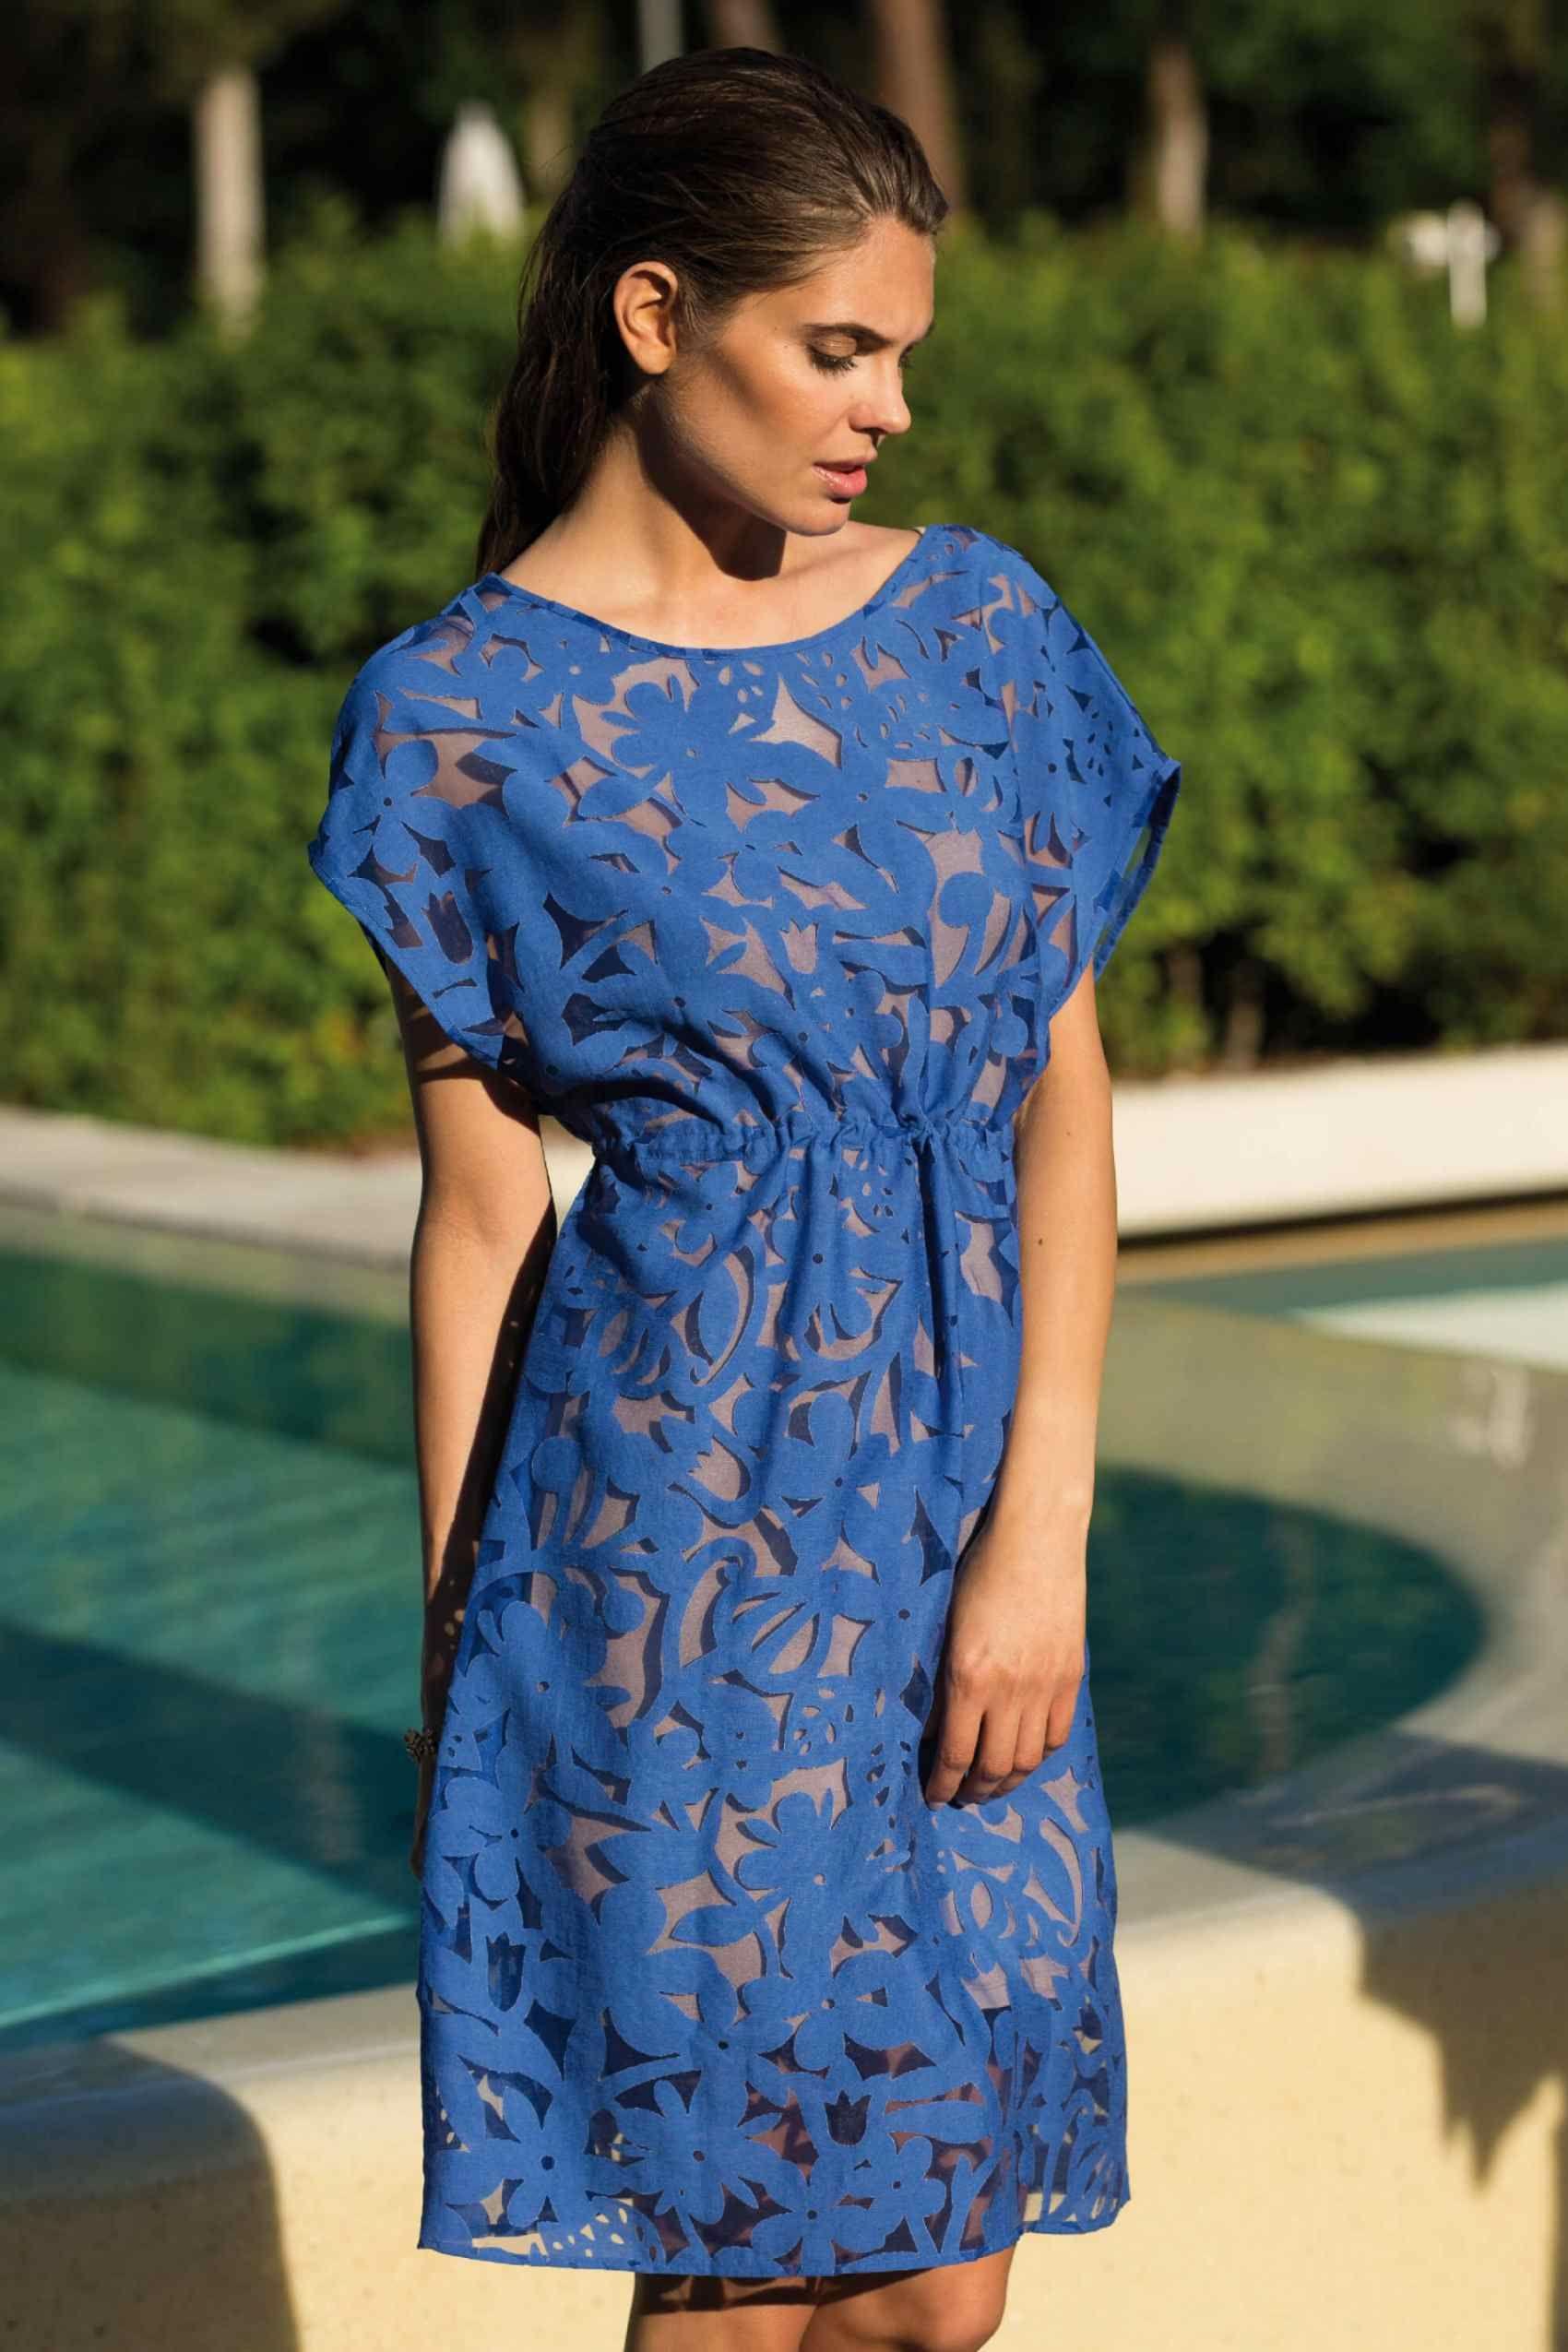 BeachDress| Pool Party Dress | buchis friend | Pinterest | Pool ...